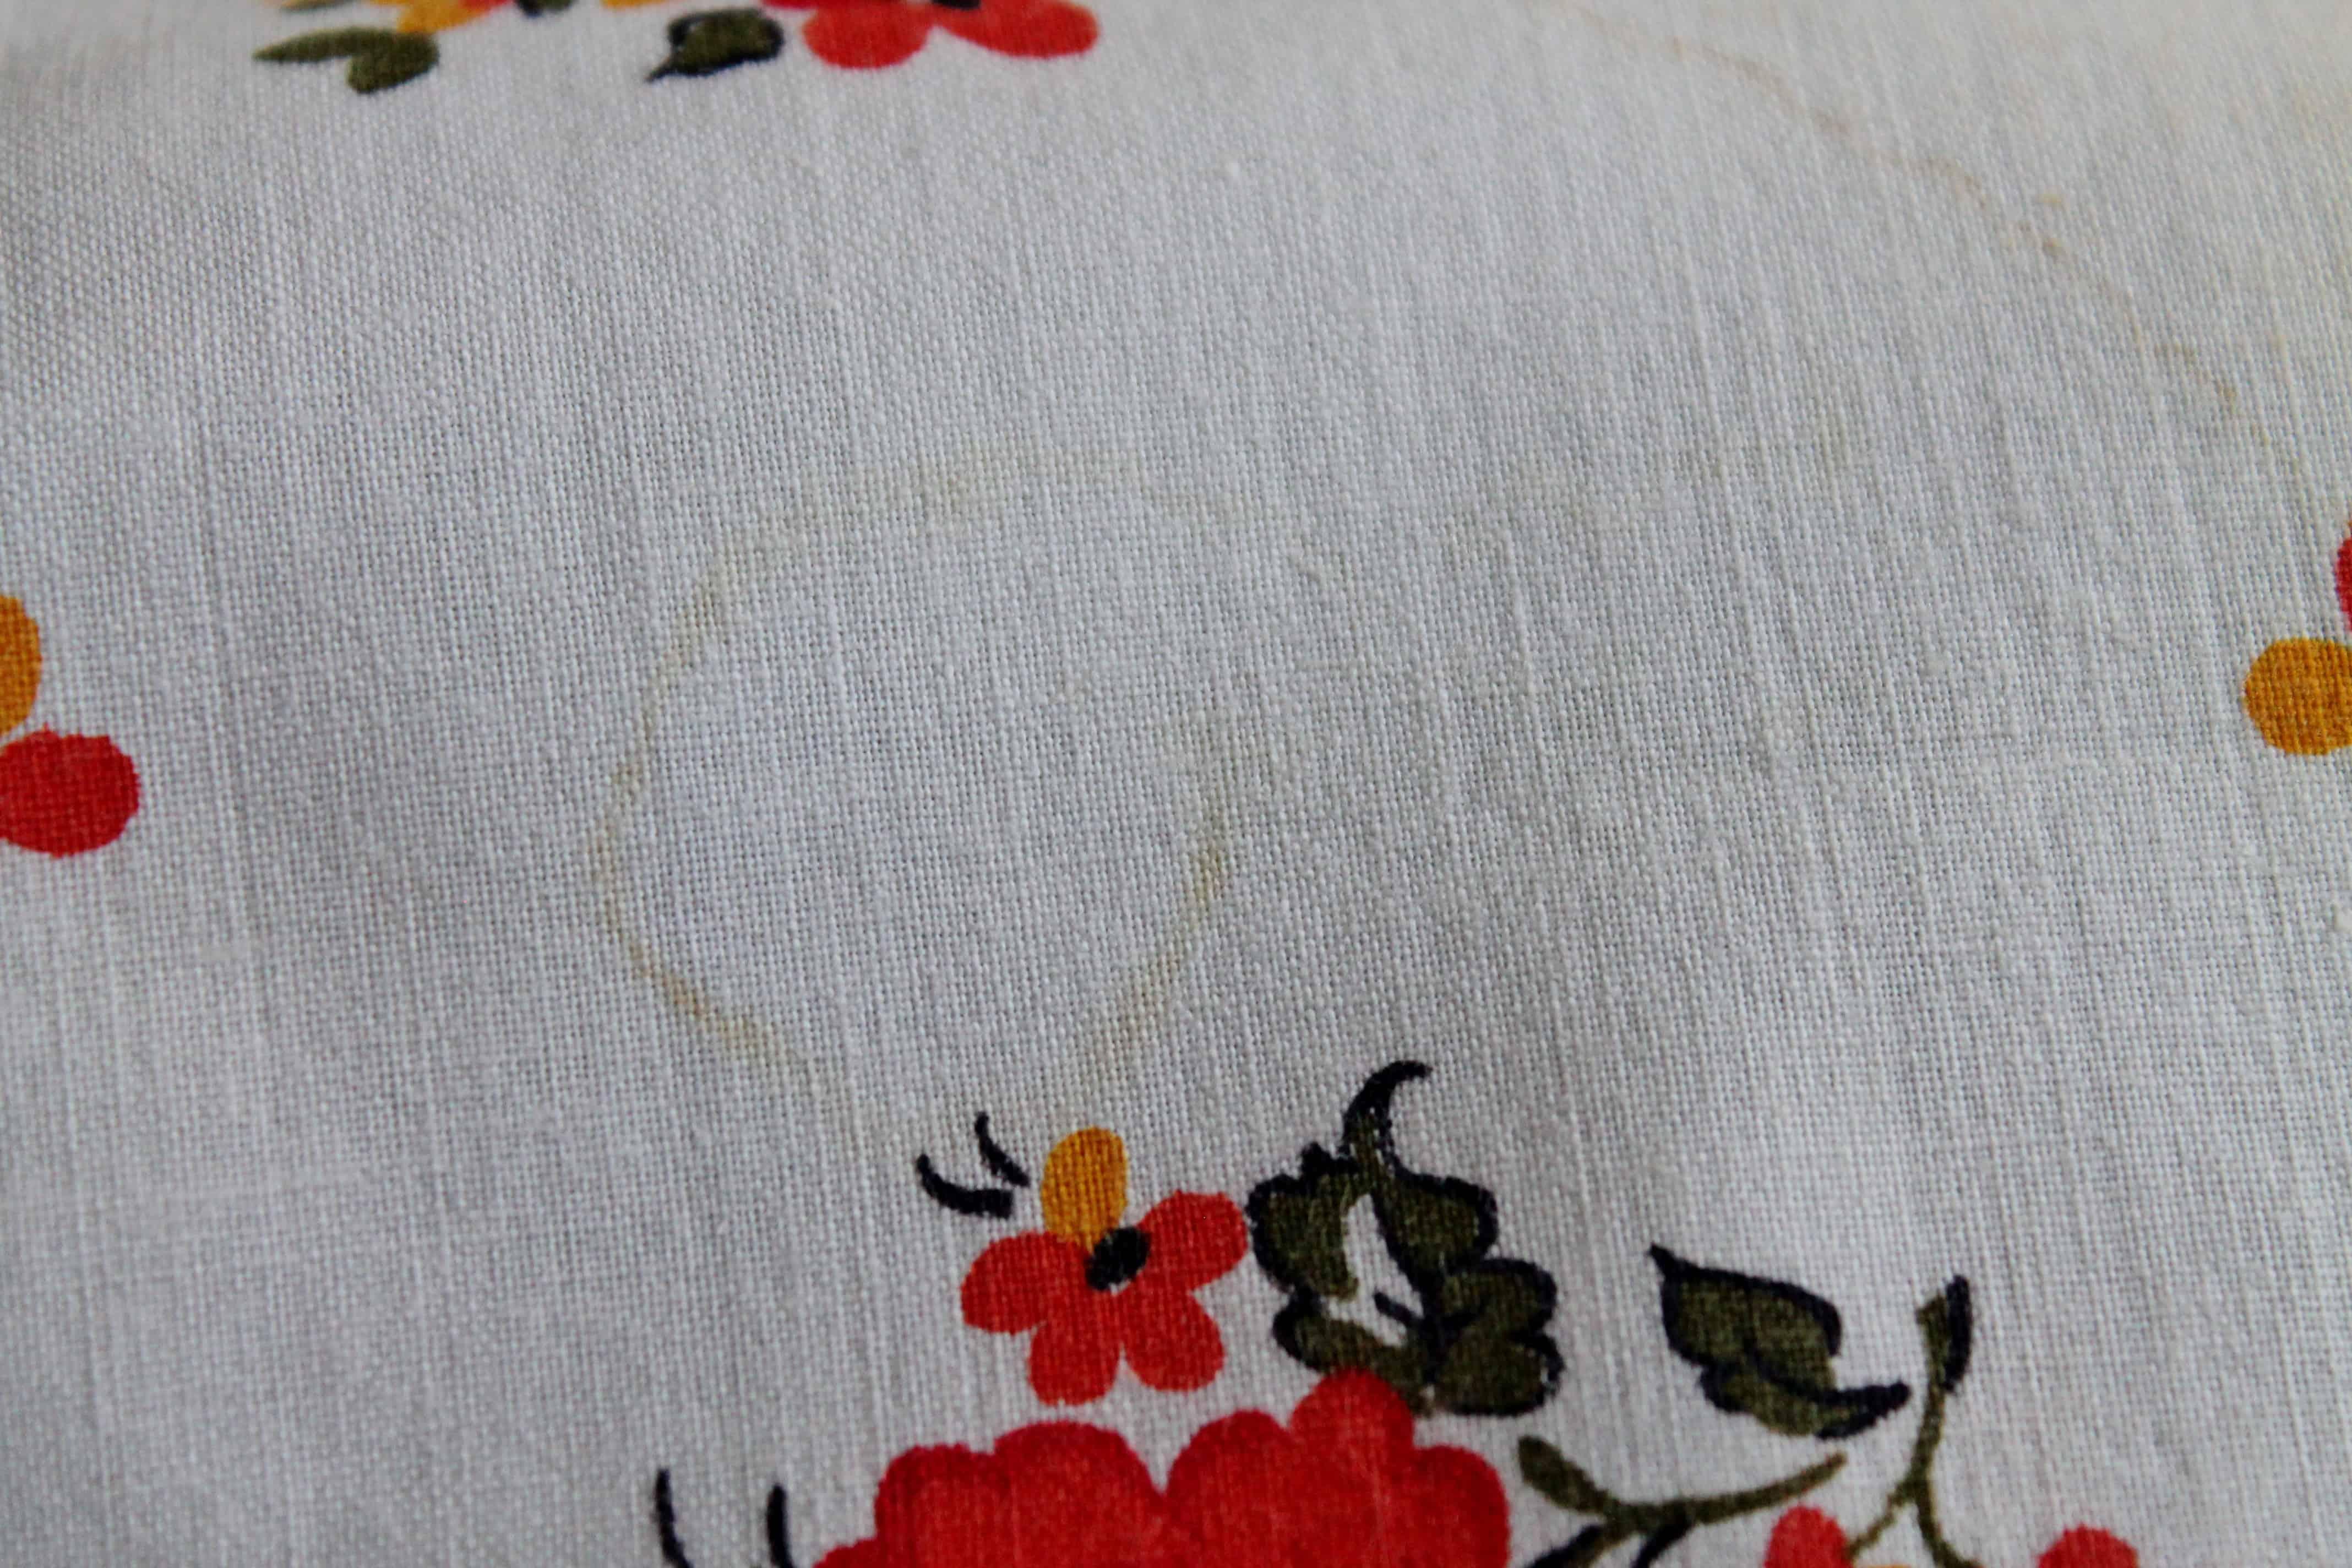 Scorch mark diminished on vintage apron